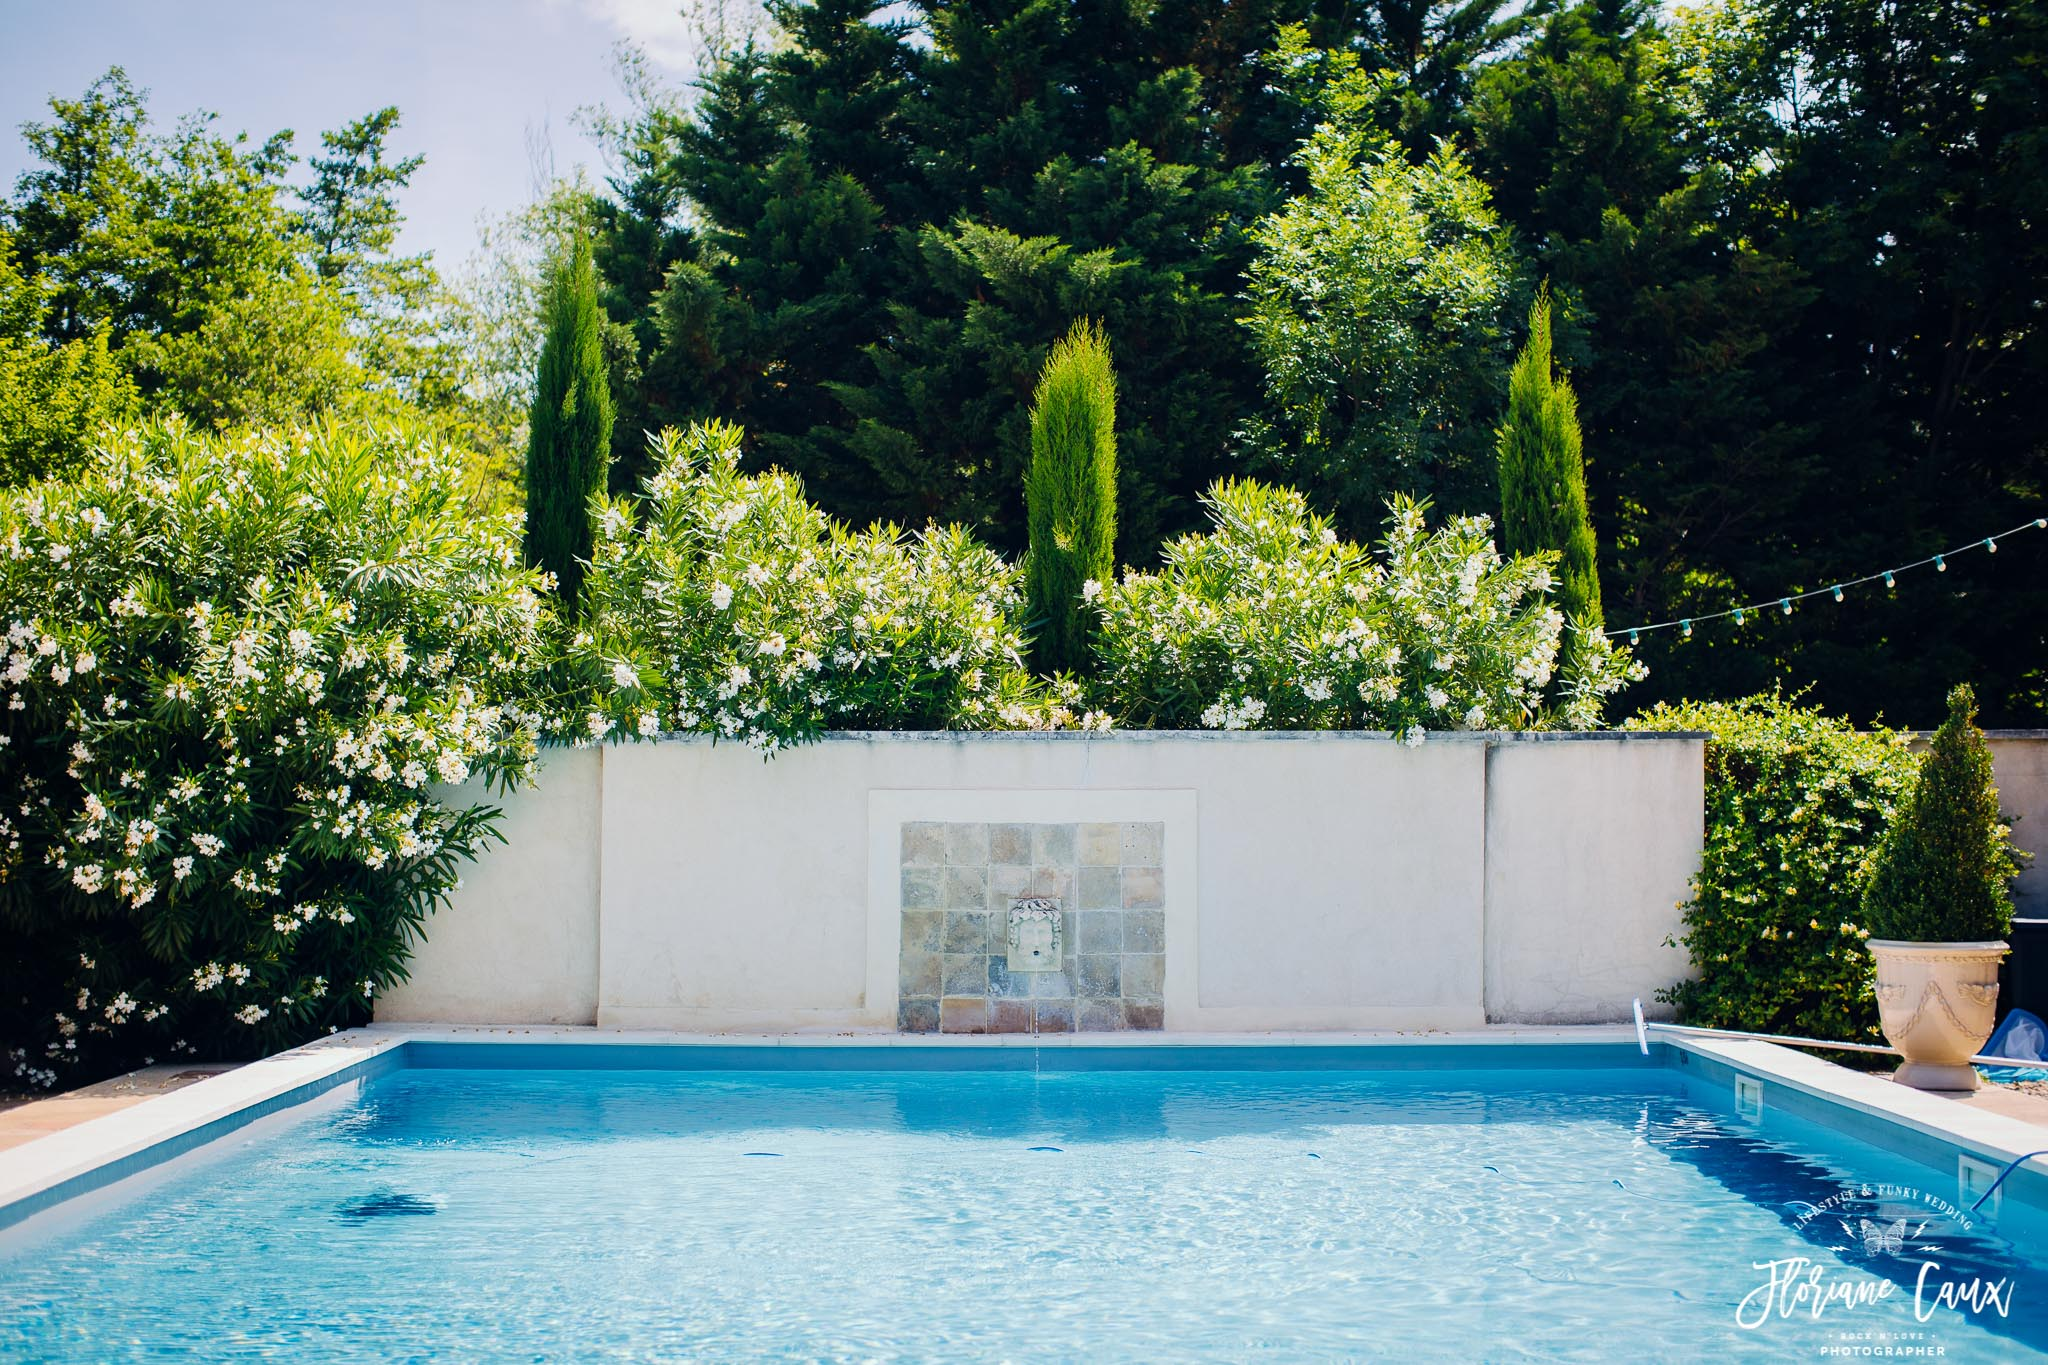 piscine domaine de blanche fleur avignon